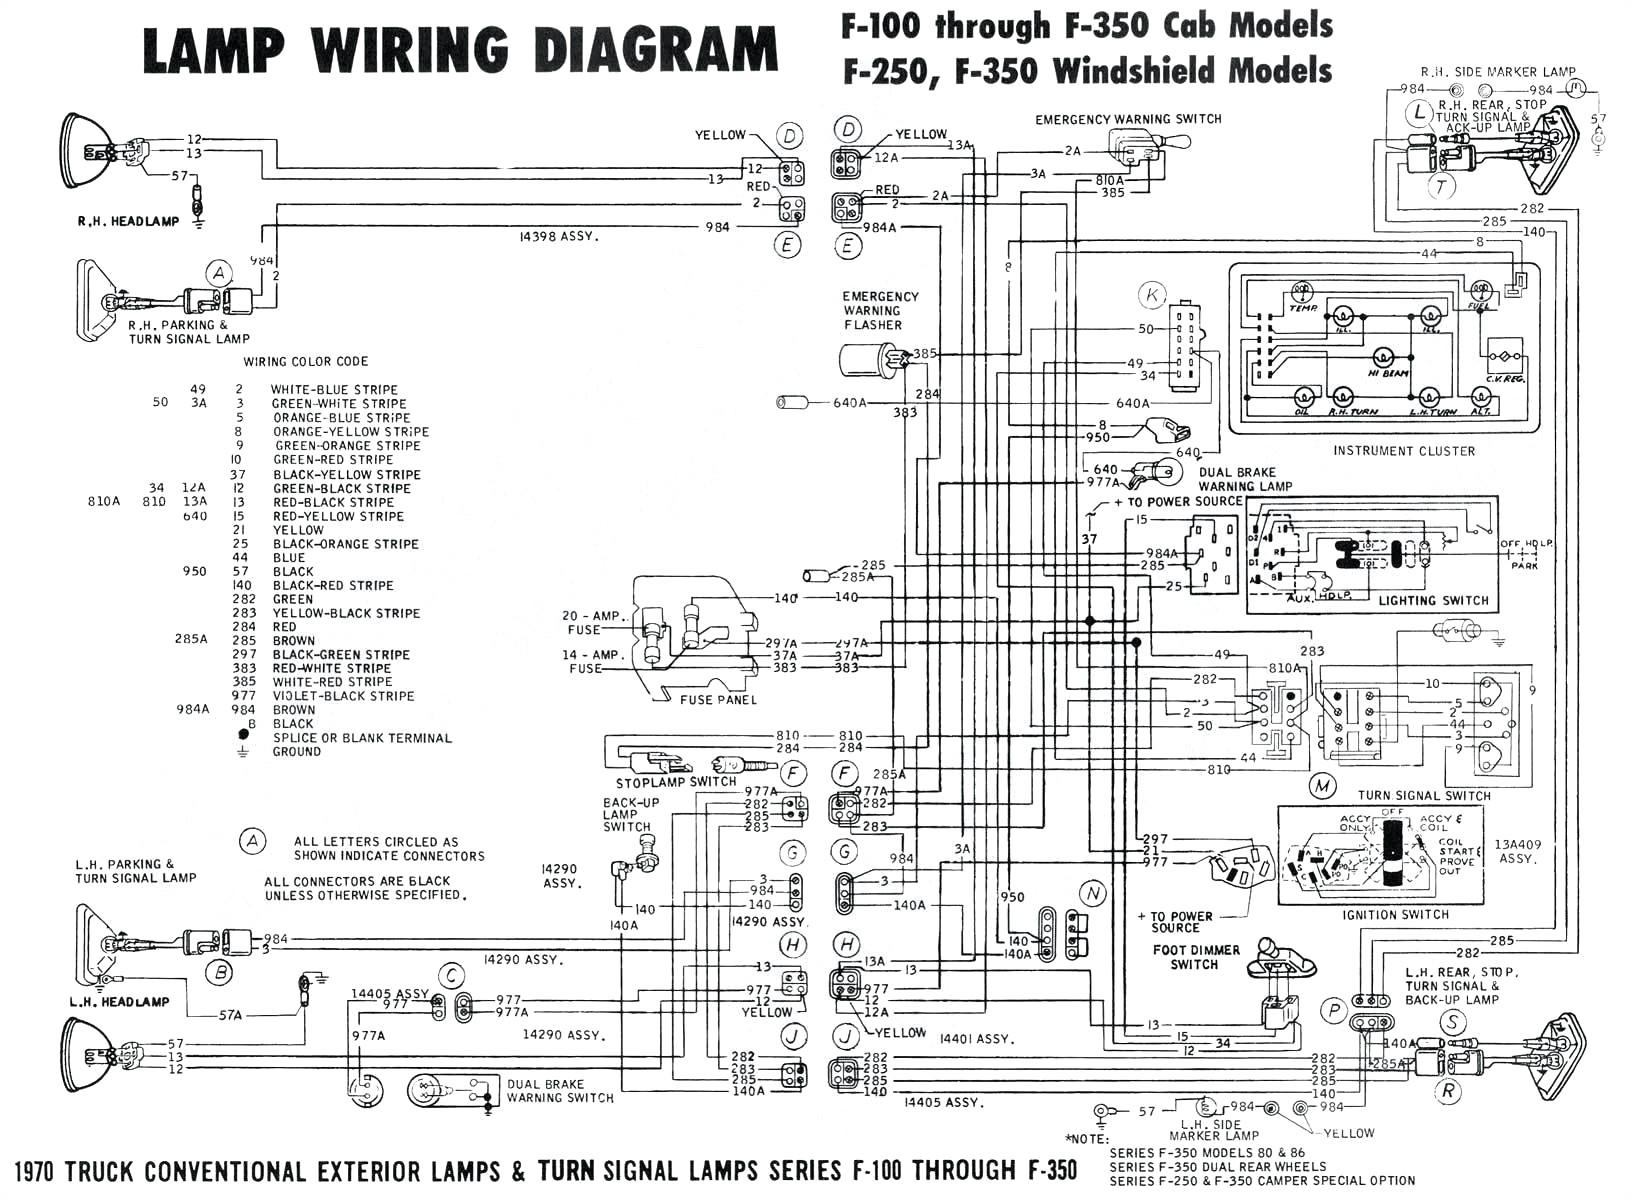 ford f650 wiring diagram ford f650 wiring diagram ford f 150 headlight wiring diagram wire center u2022 rh daniablub 7j jpg